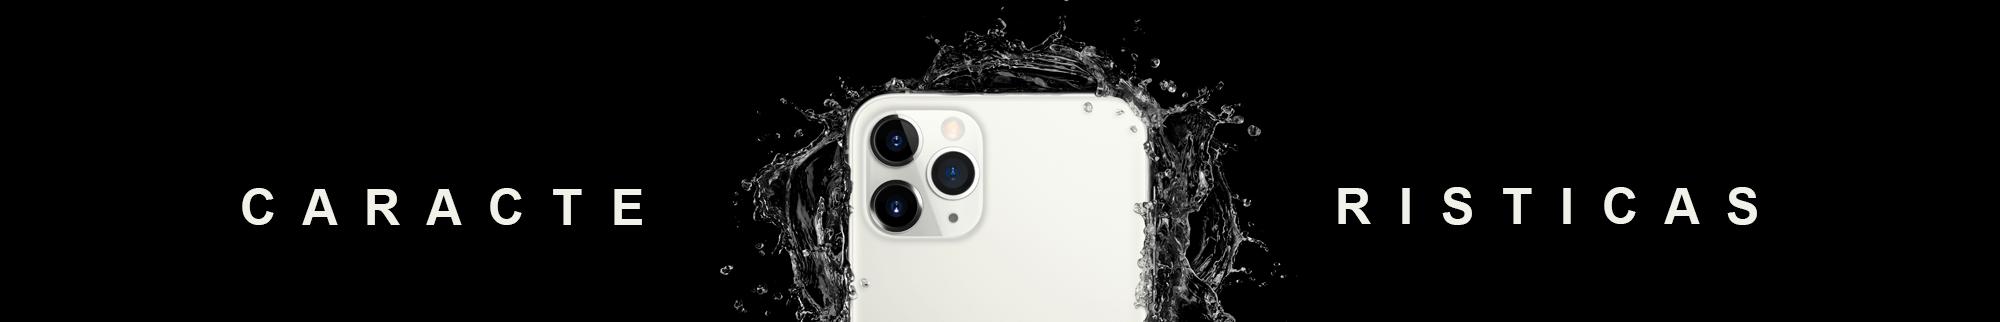 caracteristicas-iphone-11-pro.png